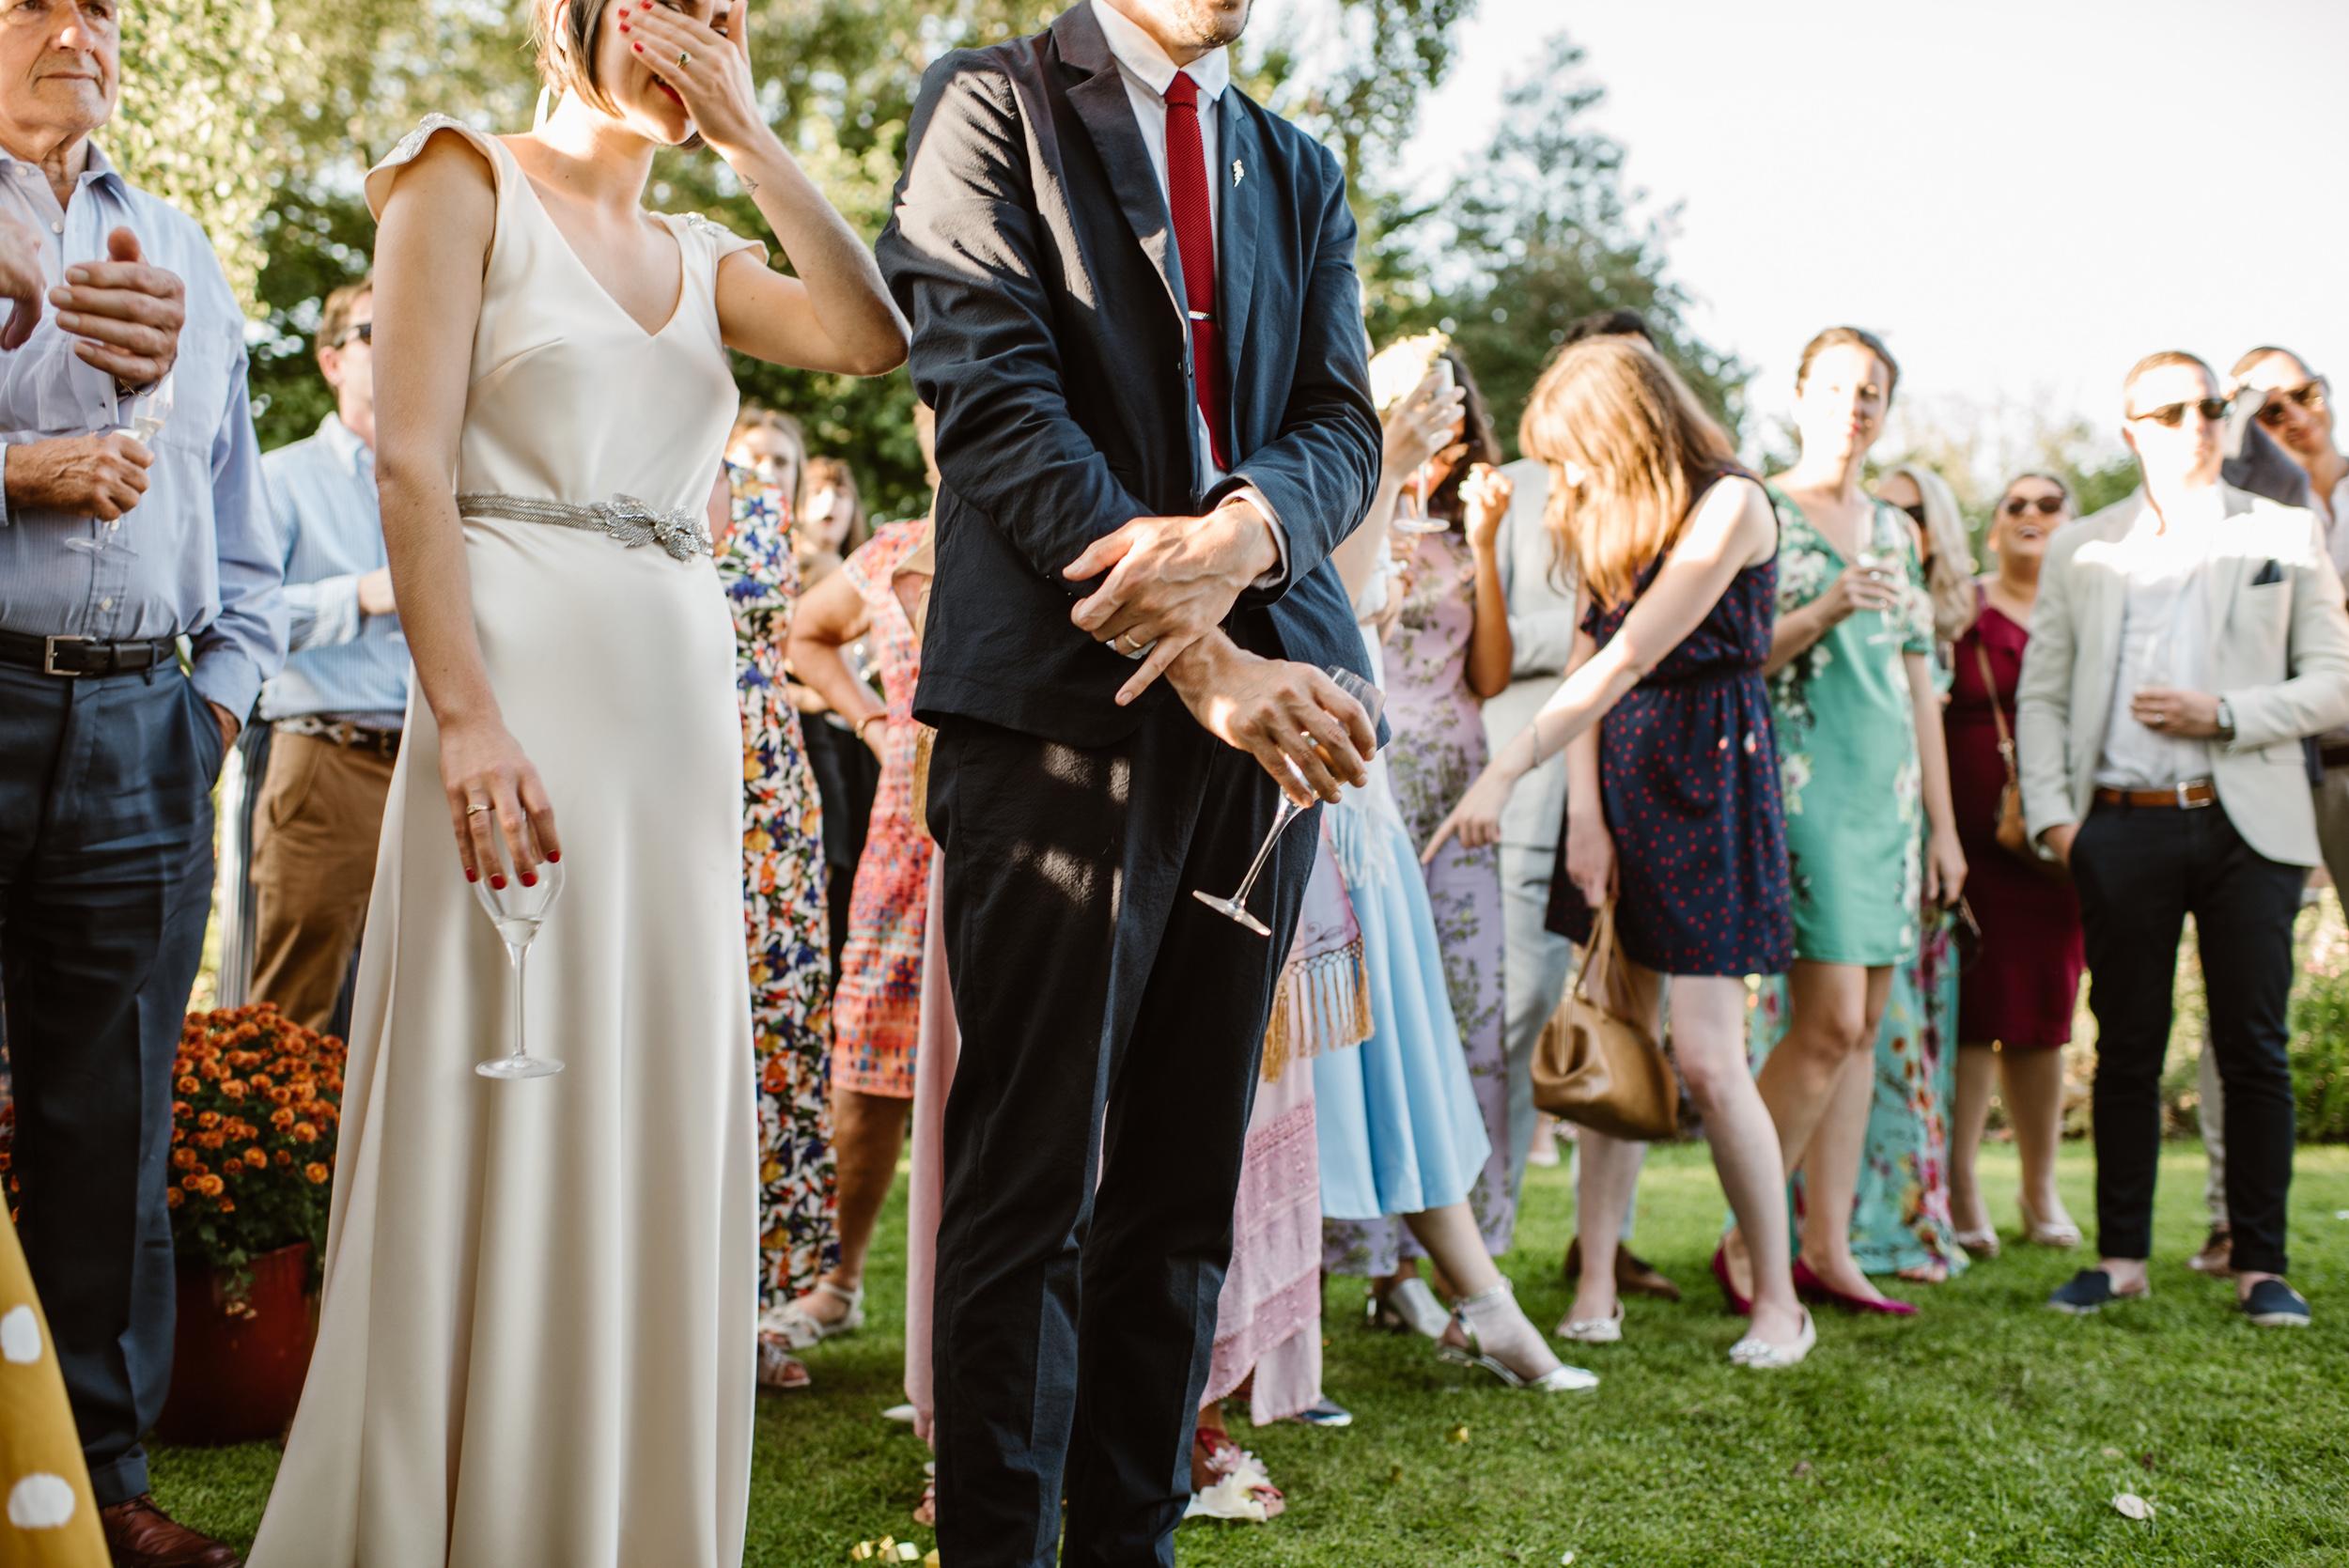 Ro-Kate-Beaumont-bias-cut-silk-wedding-gown-back-garden-wedding-by-Ellie-Gillard-24.jpg